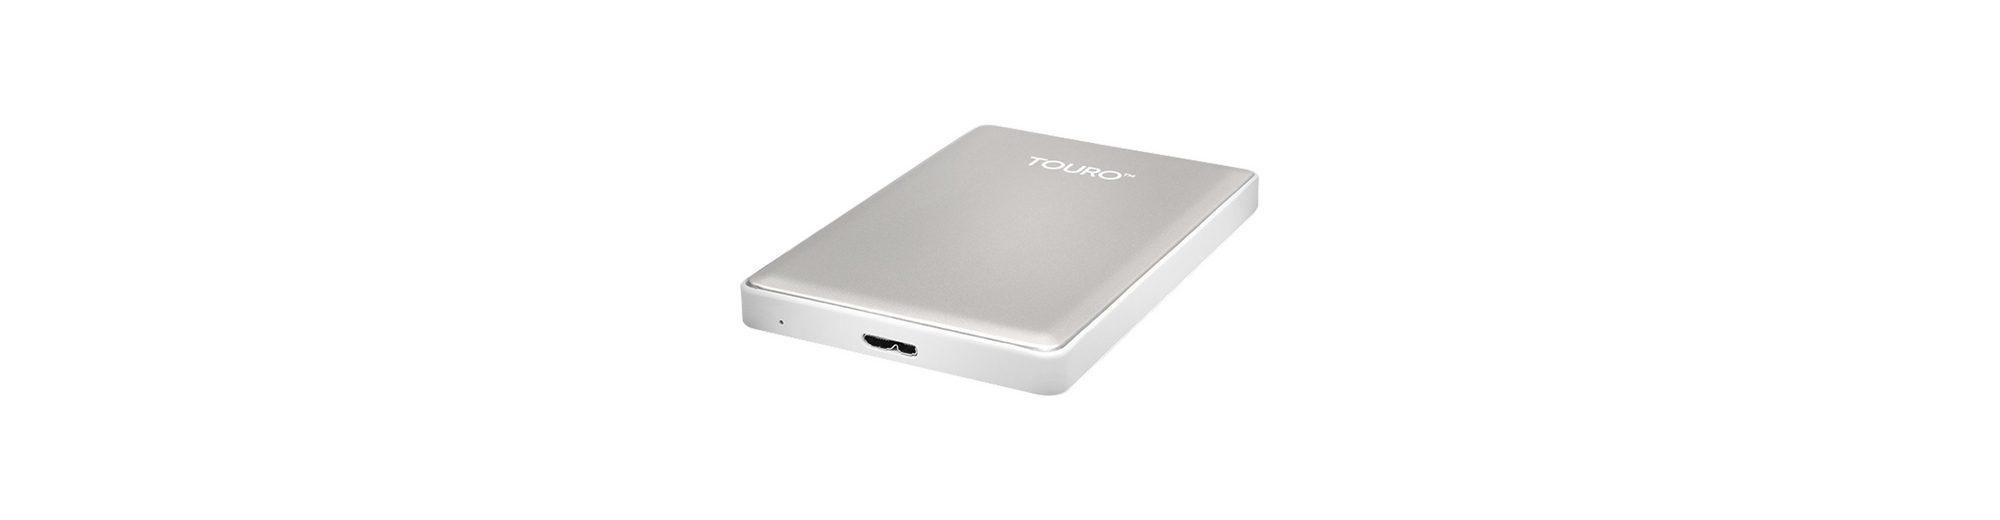 HGST Festplatte »Touro S 500 GB«